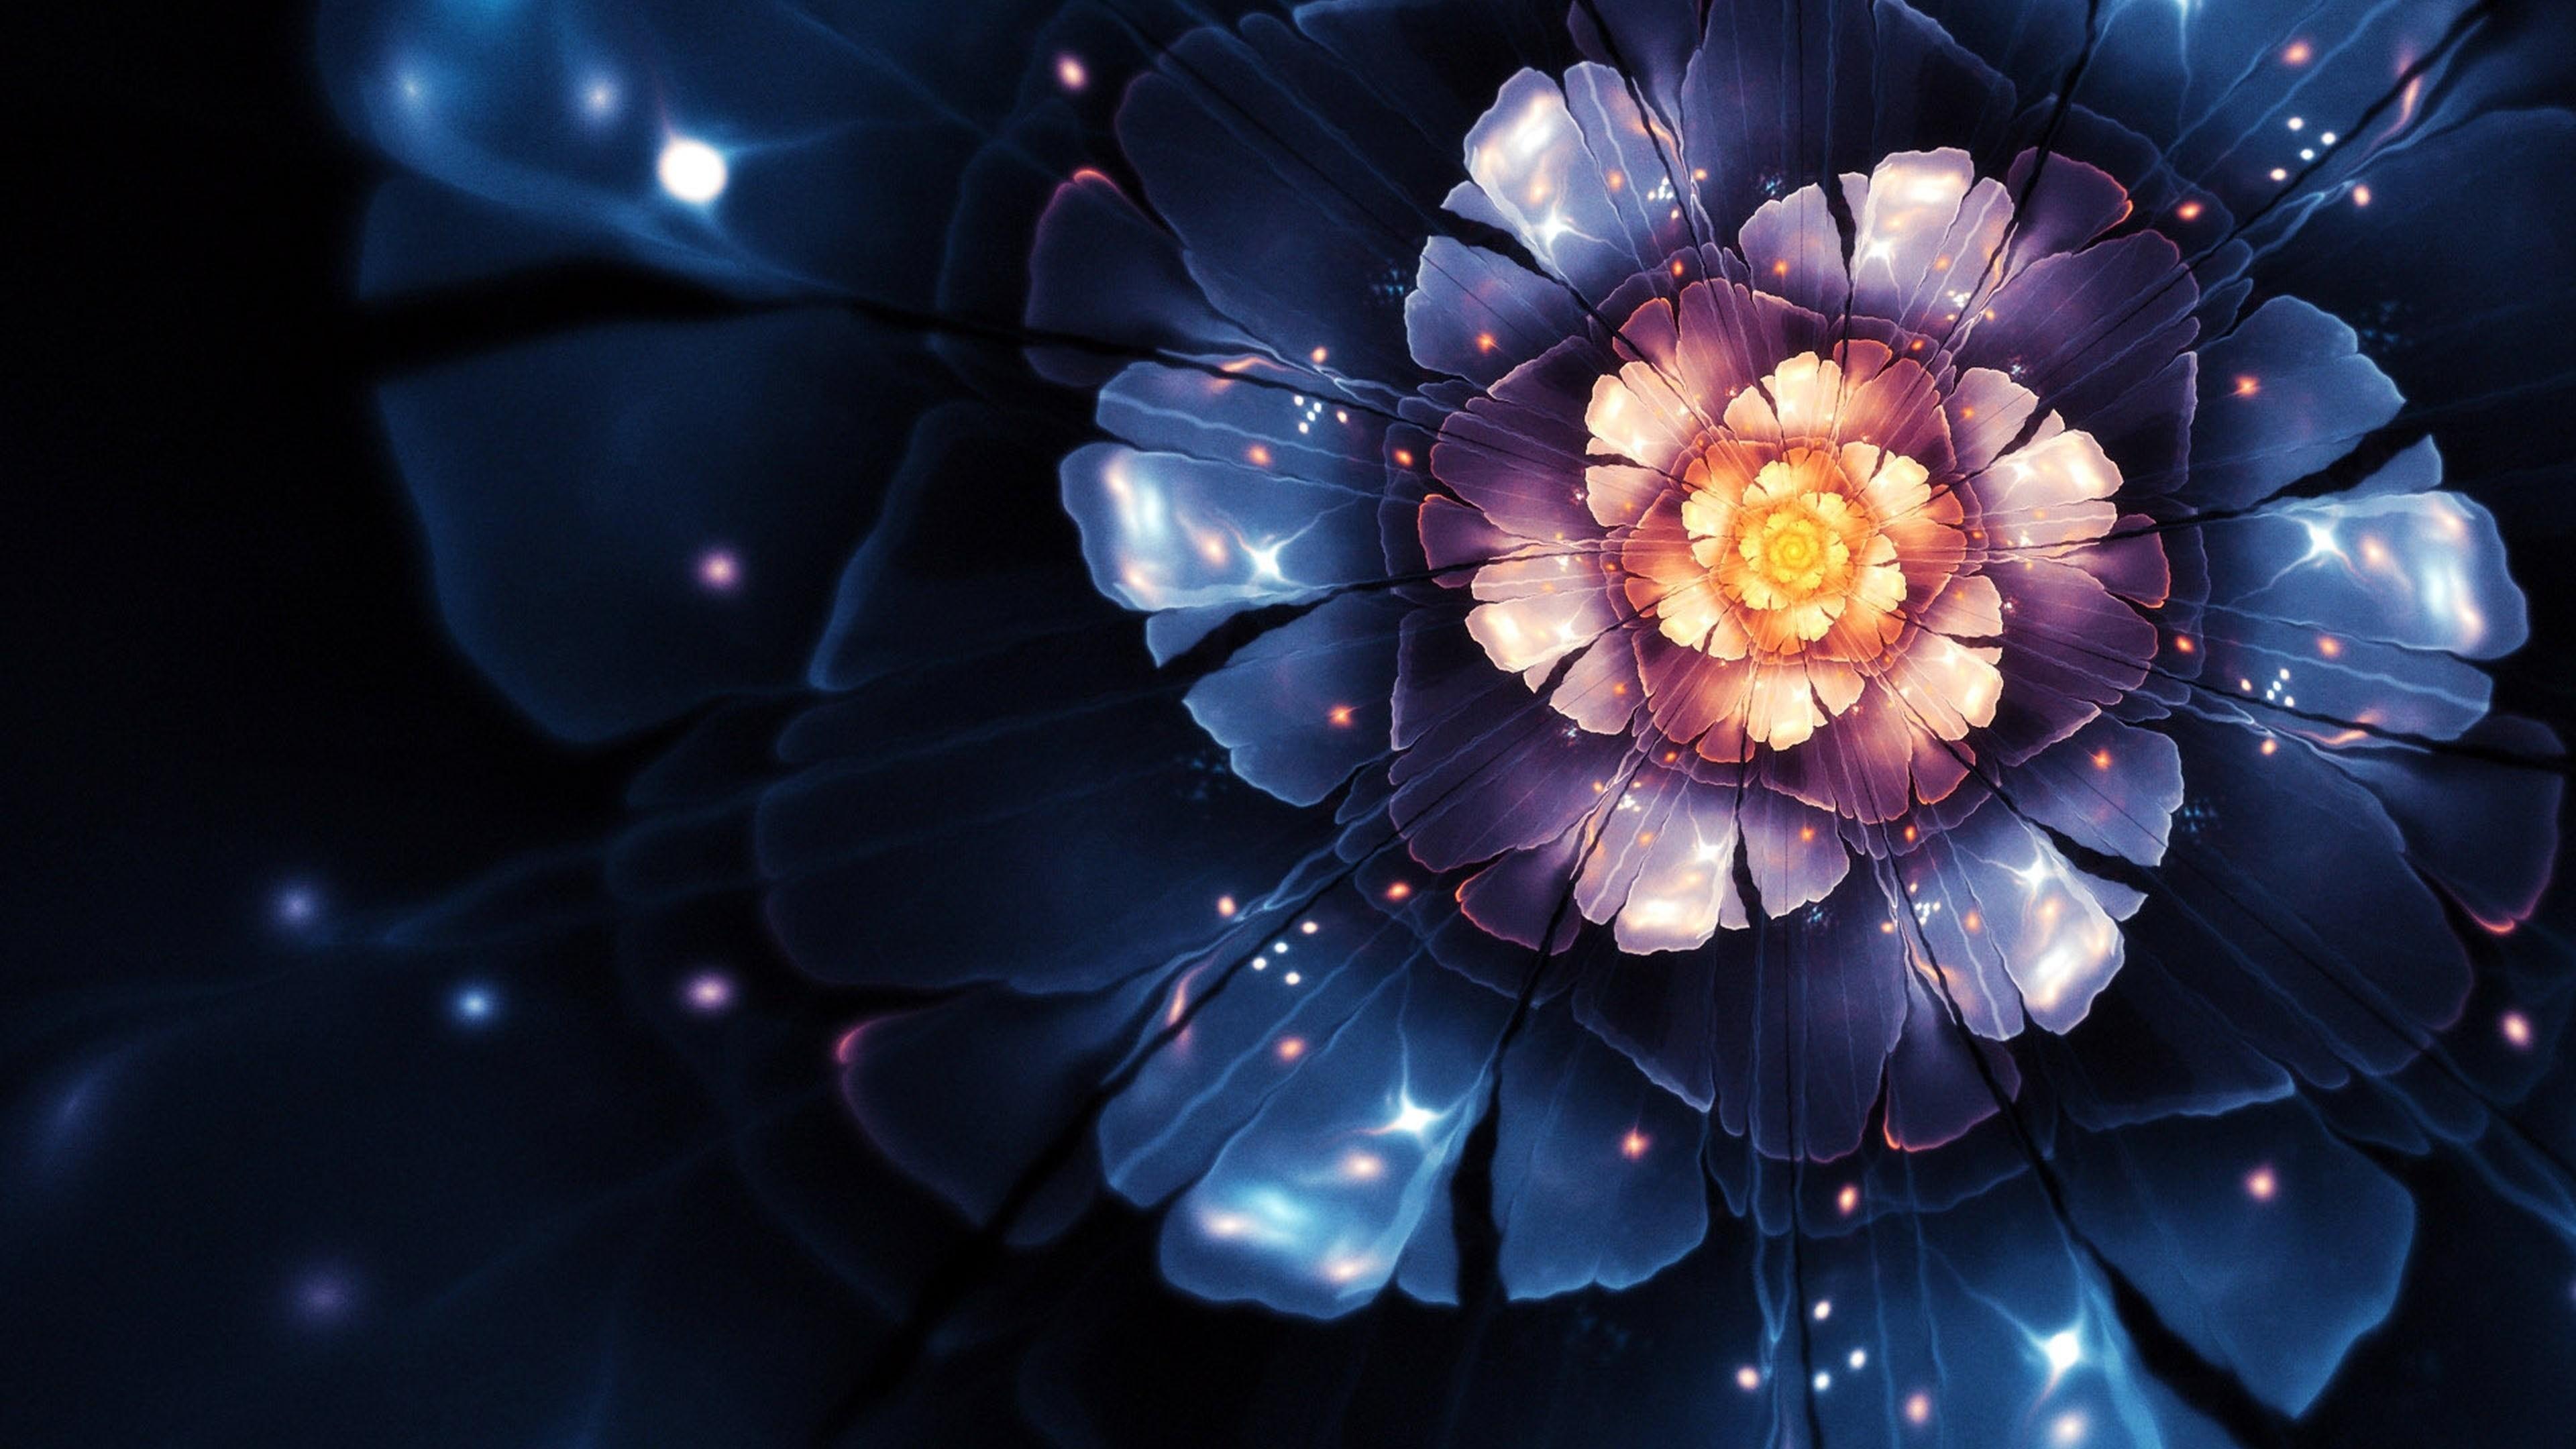 Фантастический цветок в ночном небе